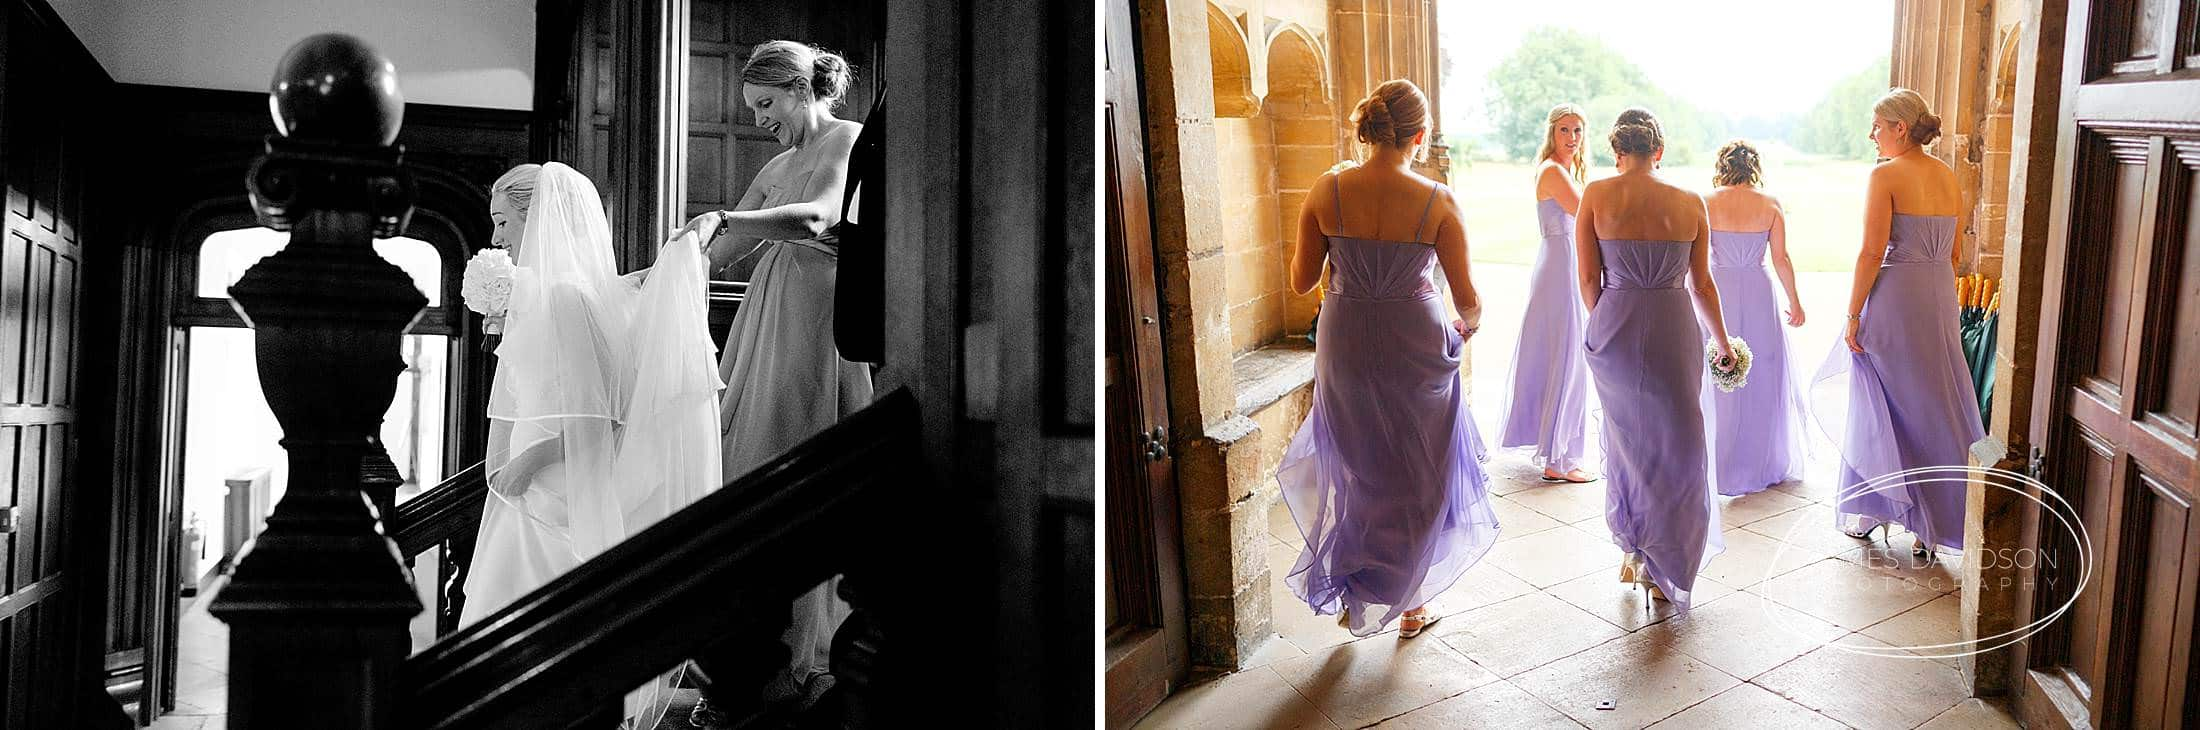 hengrave-hall-summer-wedding-033